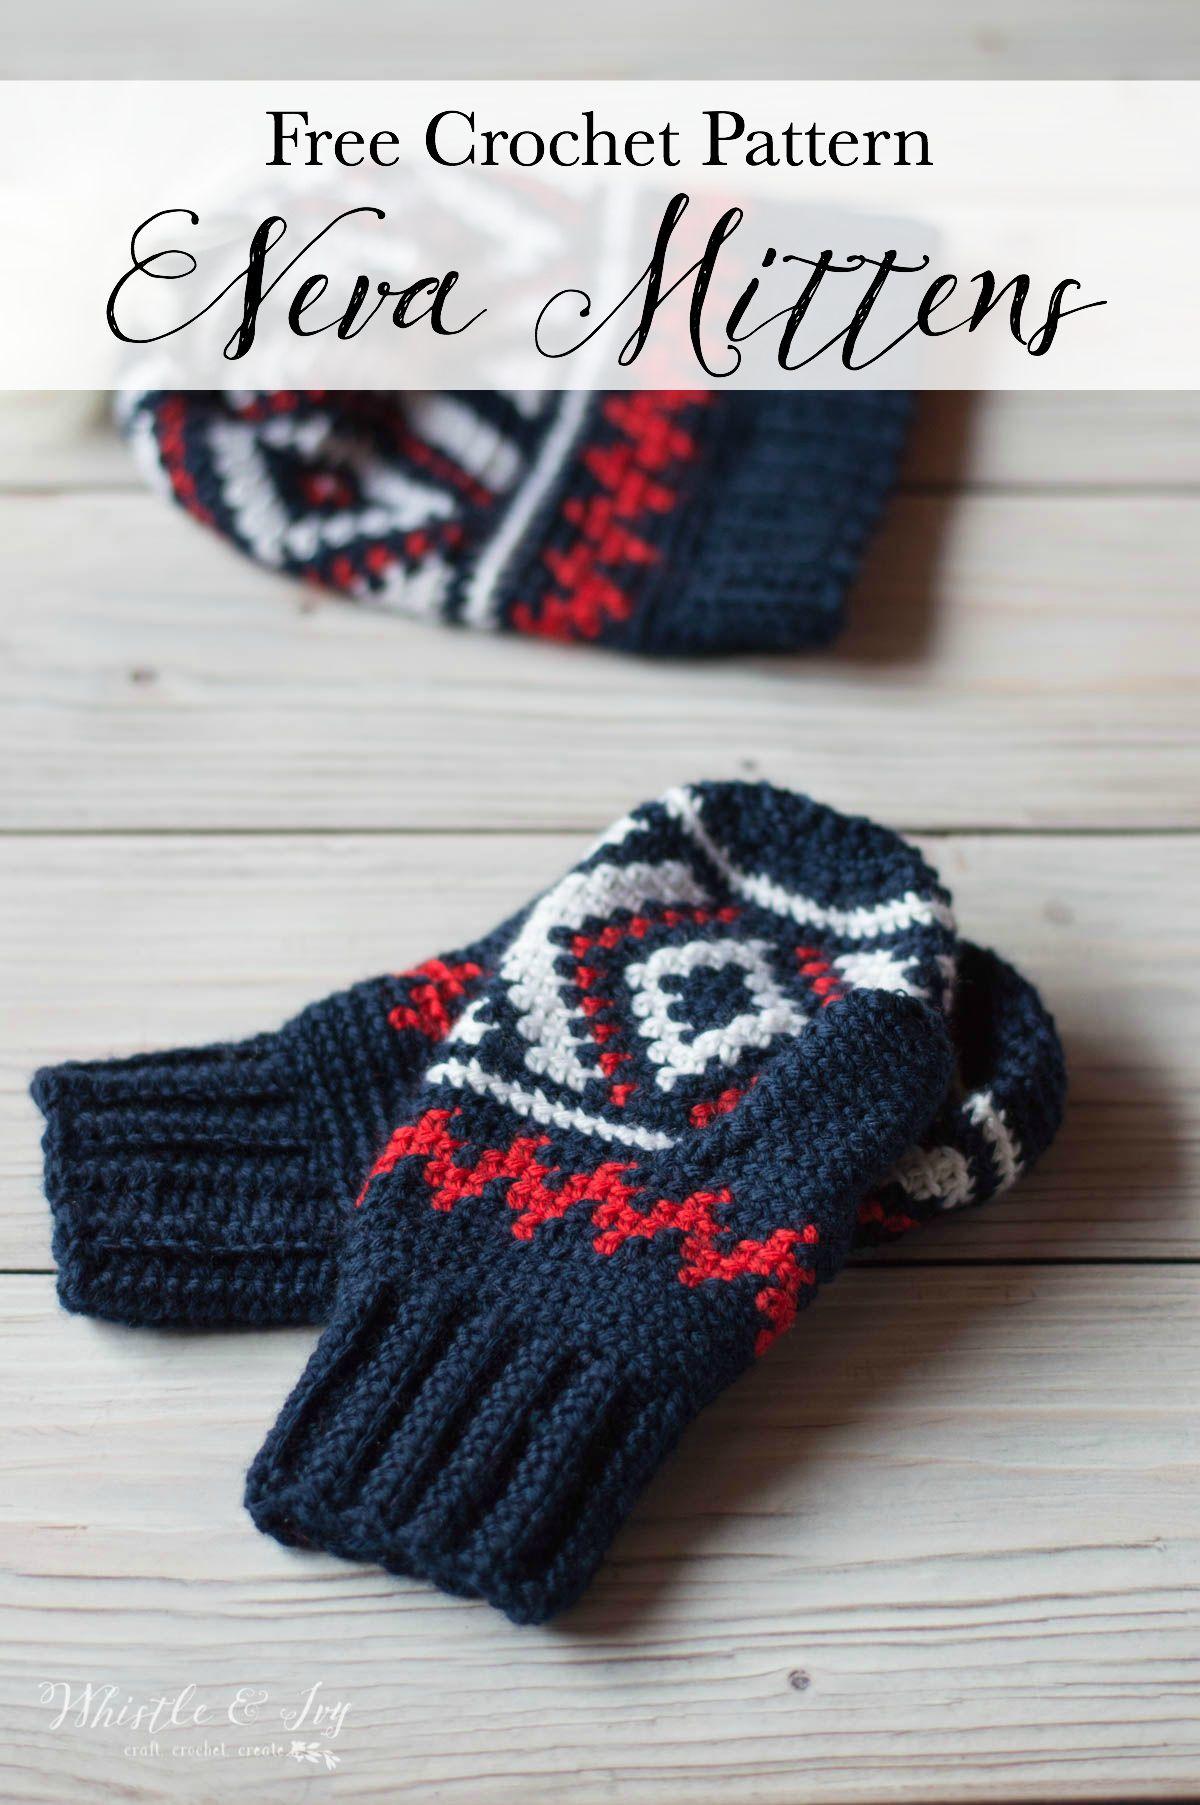 d82456be11b Fair Isle Neva Mittens - Free Crochet Pattern